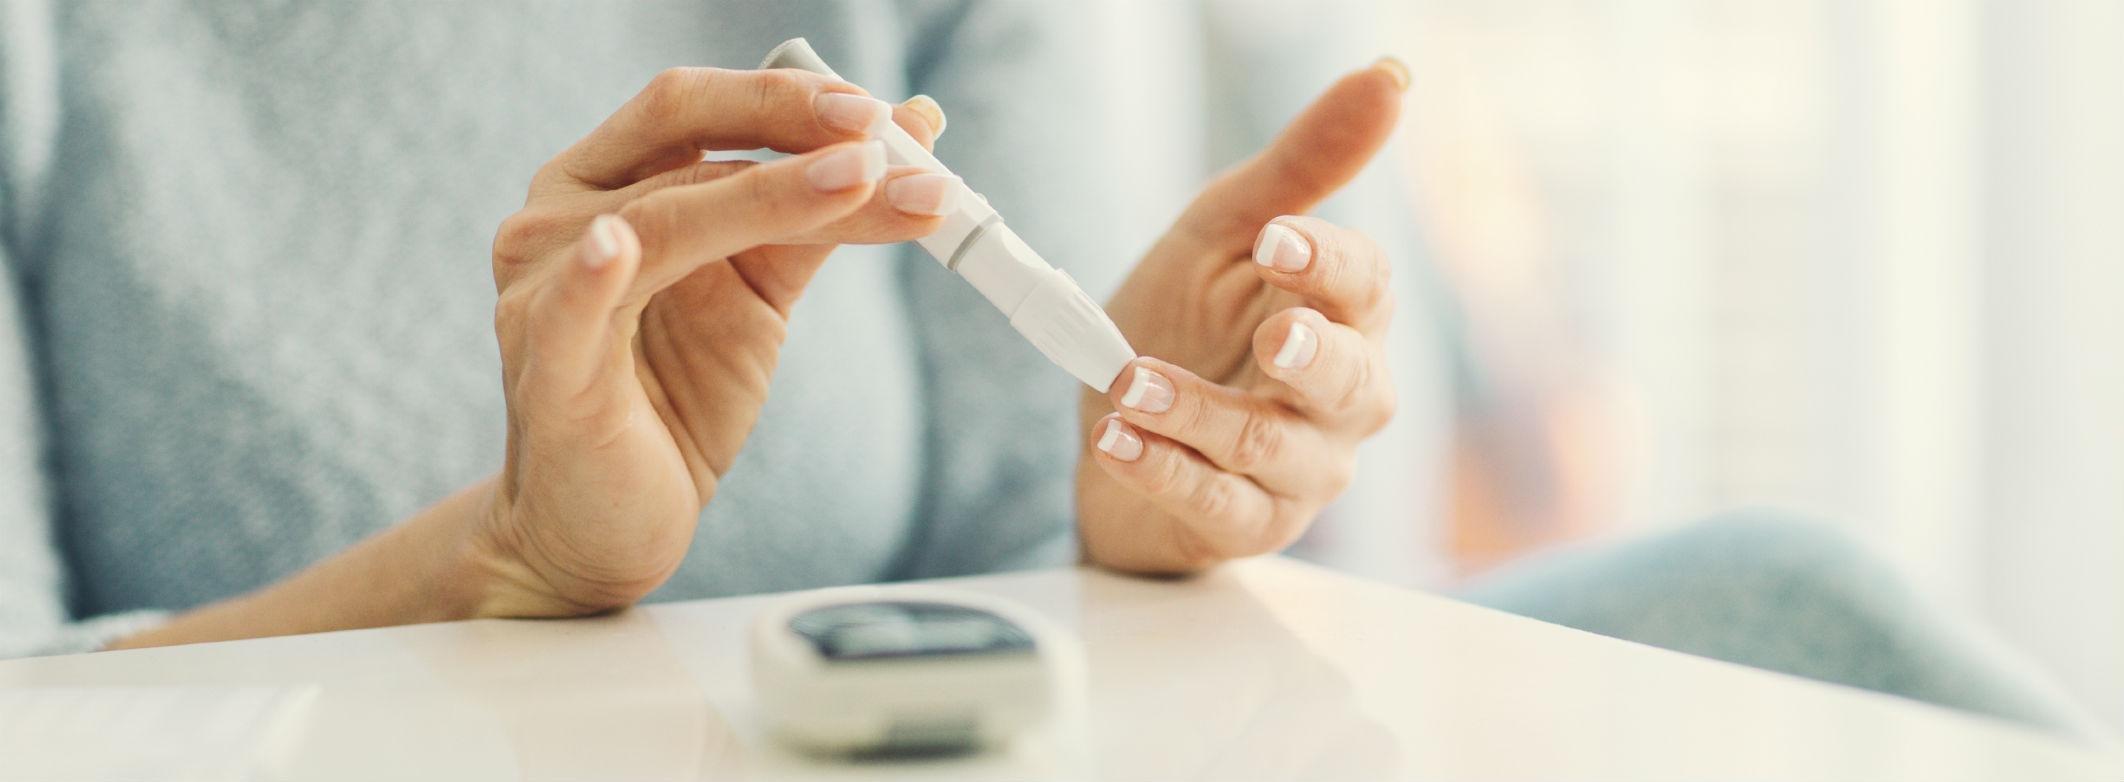 Is Diabetes Preventable?